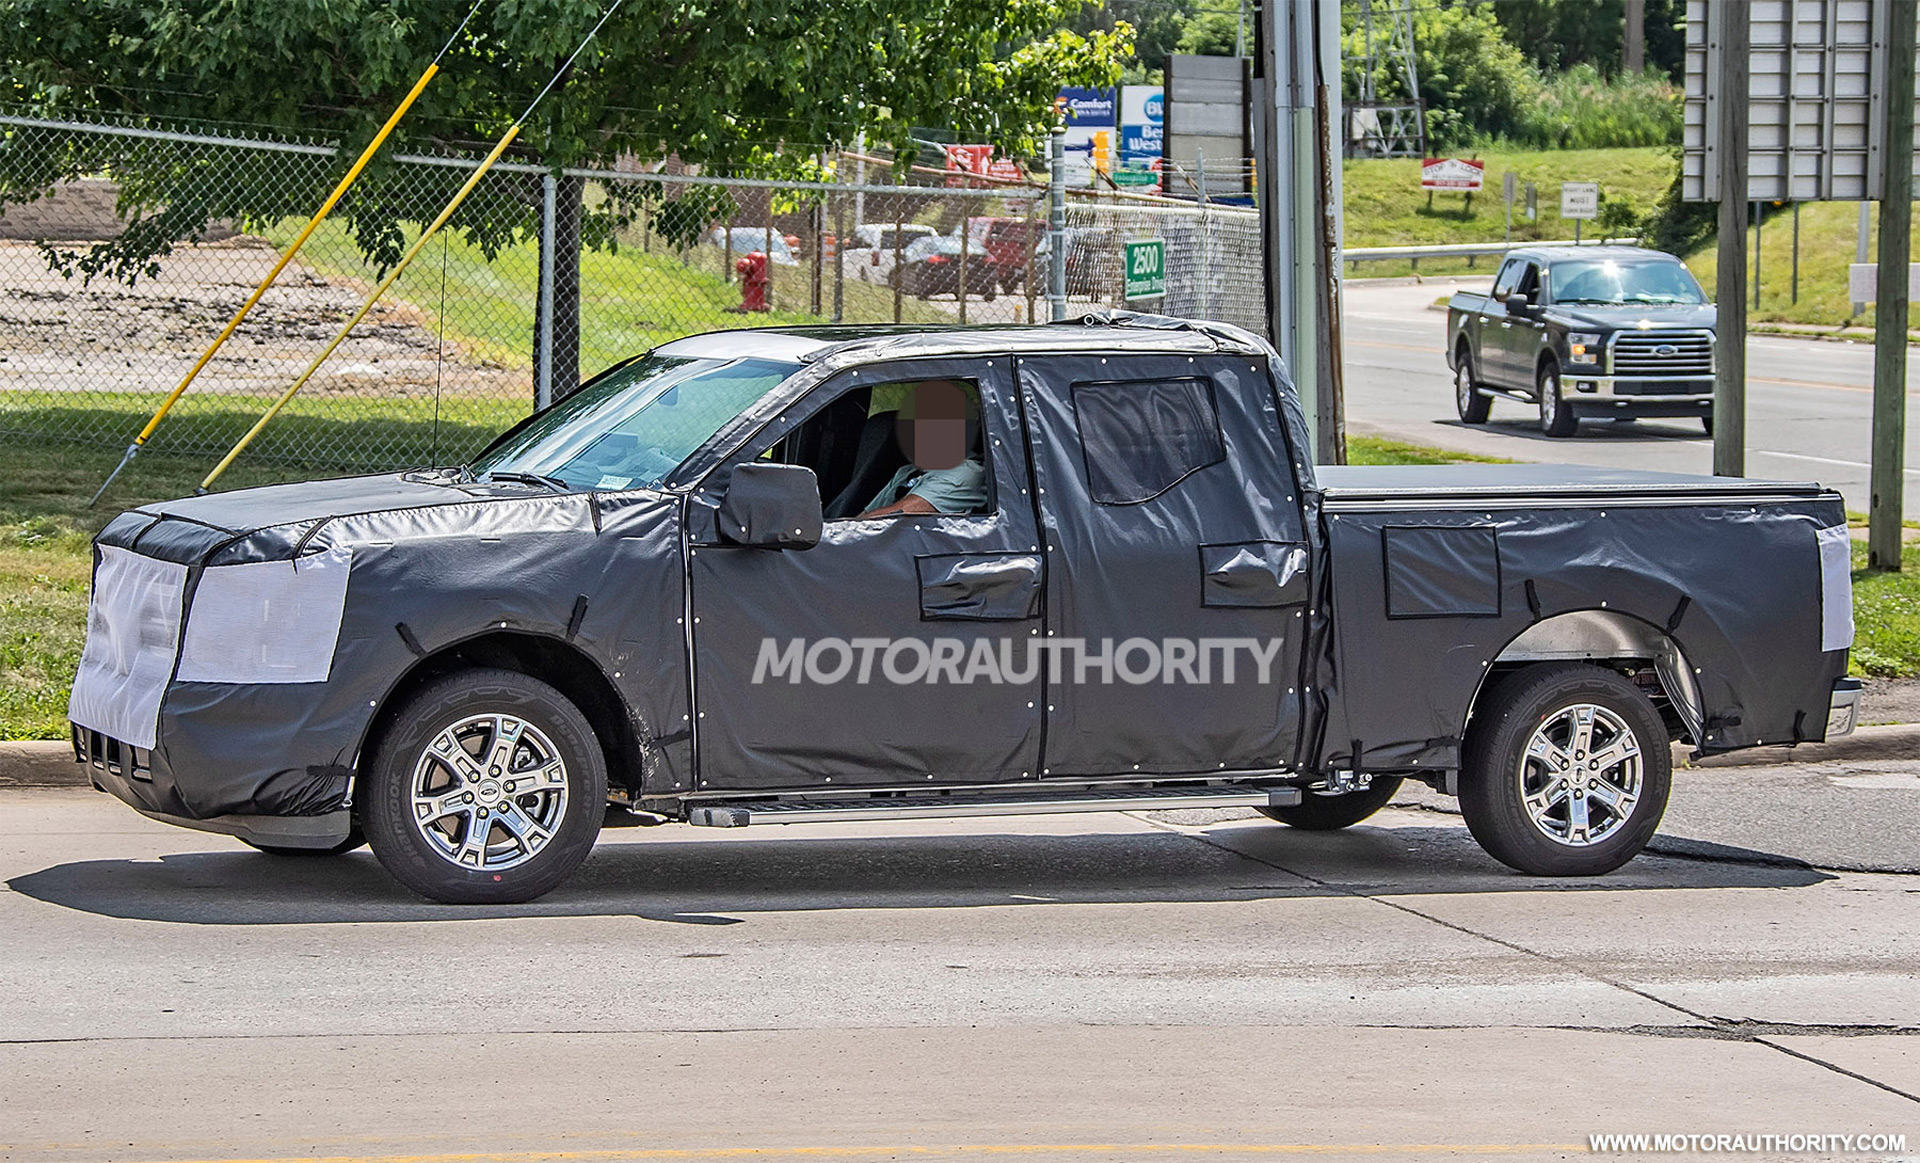 2020 - [Ford] F-Series 2021-ford-f-150-spy-shots--image-via-s-baldauf-sb-medien_100710860_h